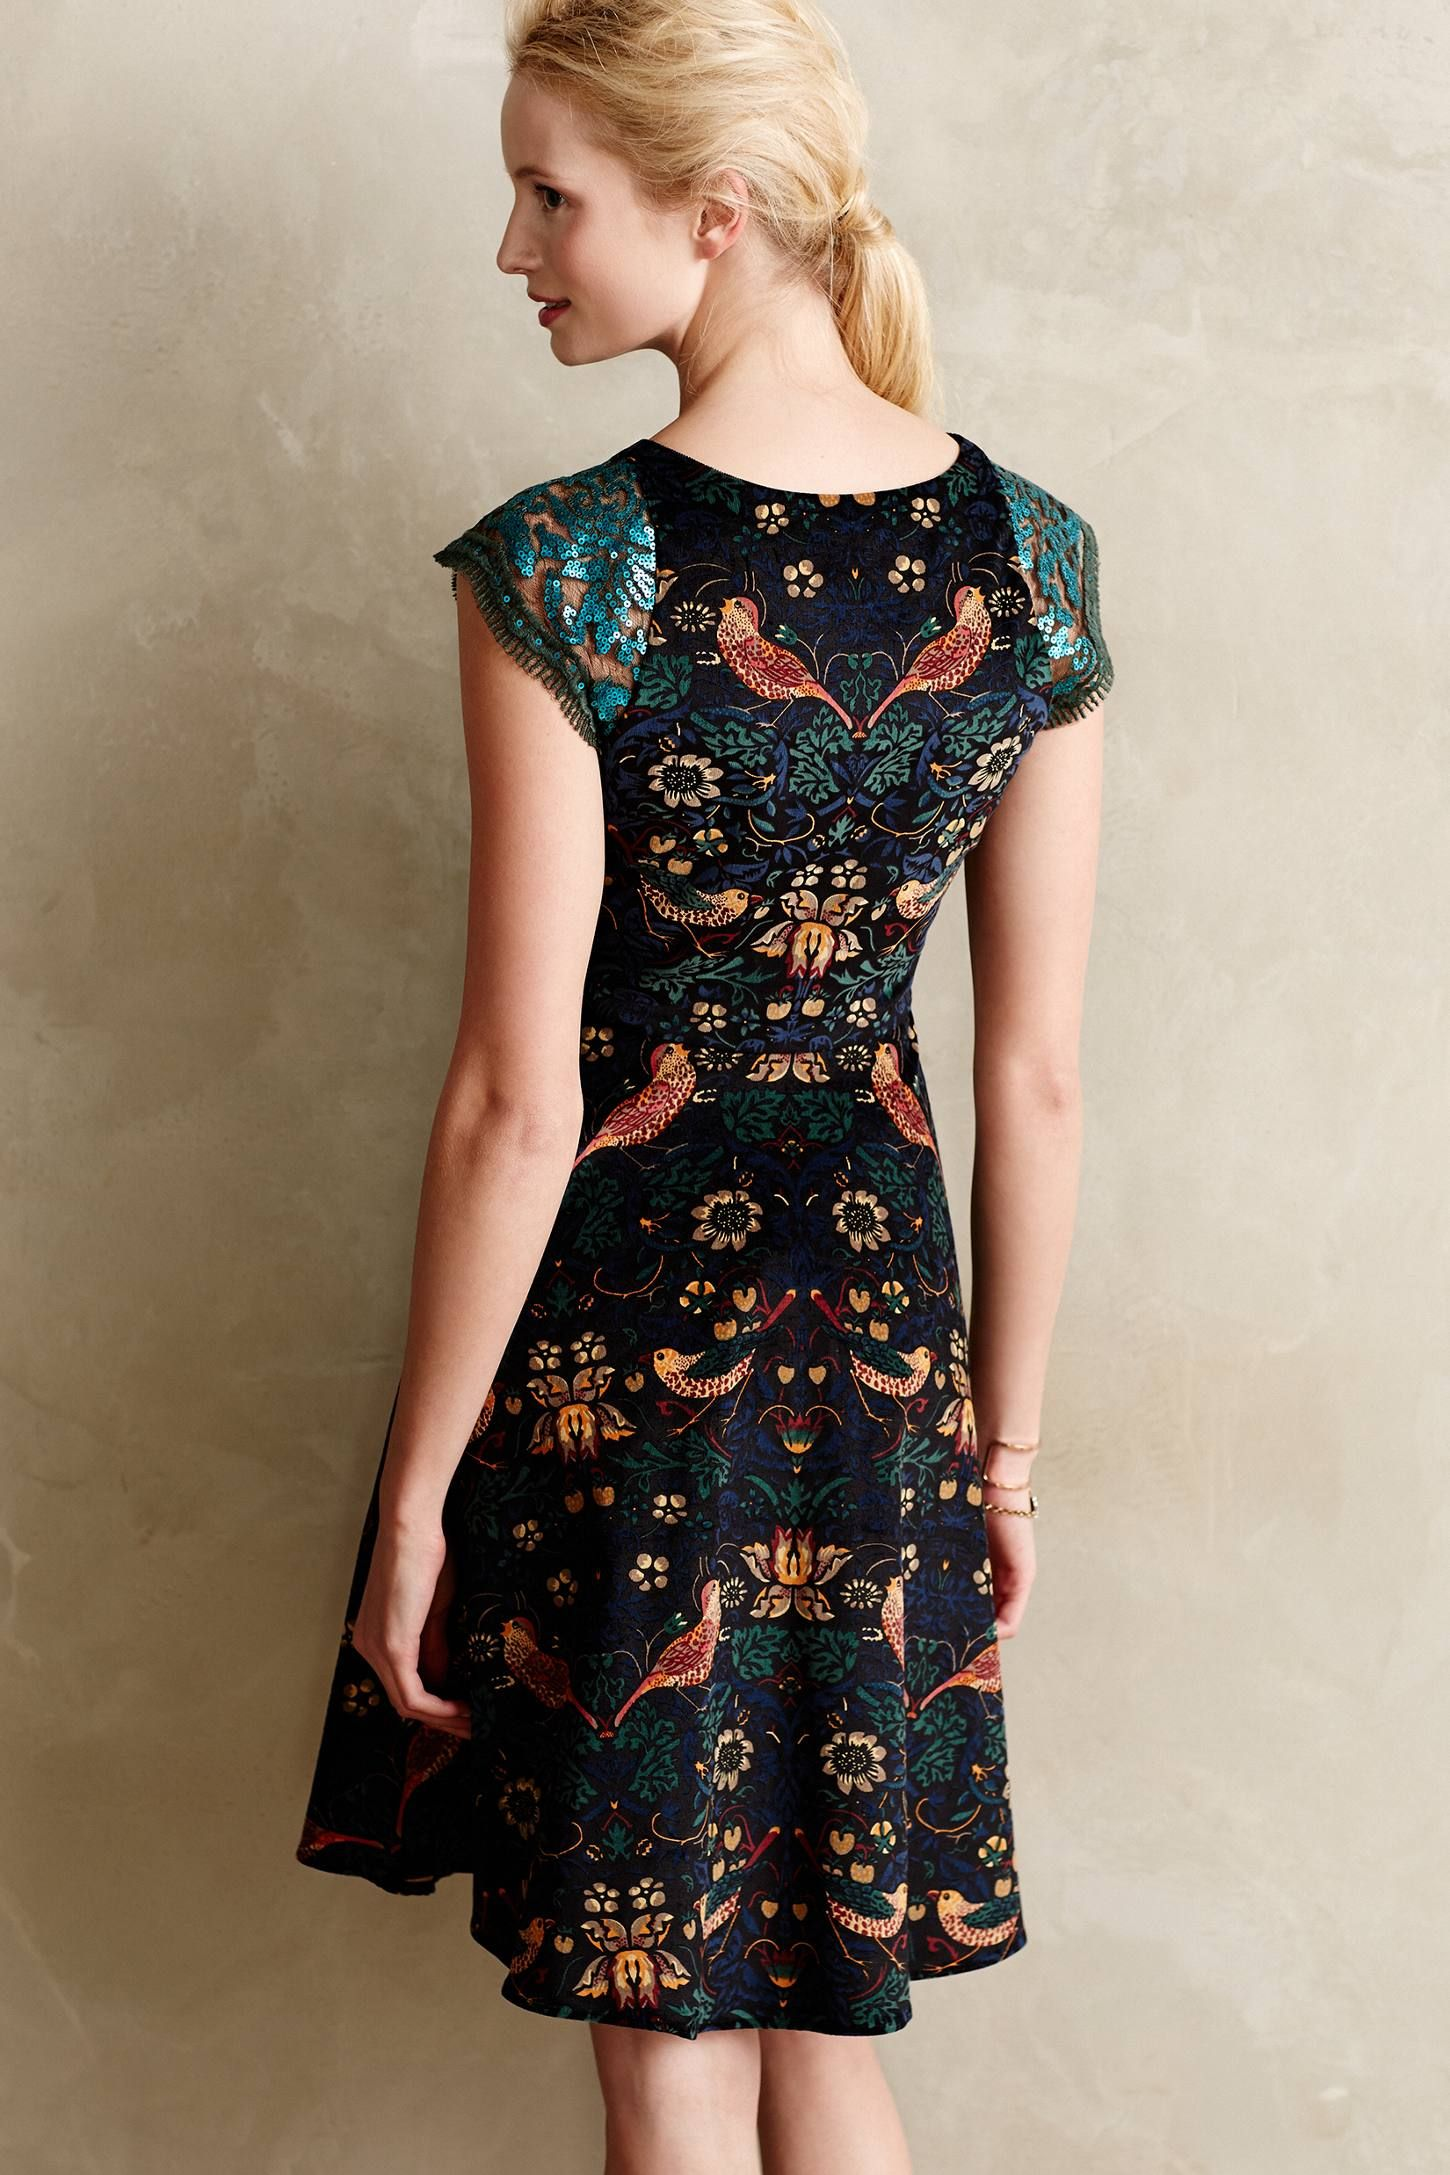 2a98499552 Larksong Corduroy Dress - anthropologie.com